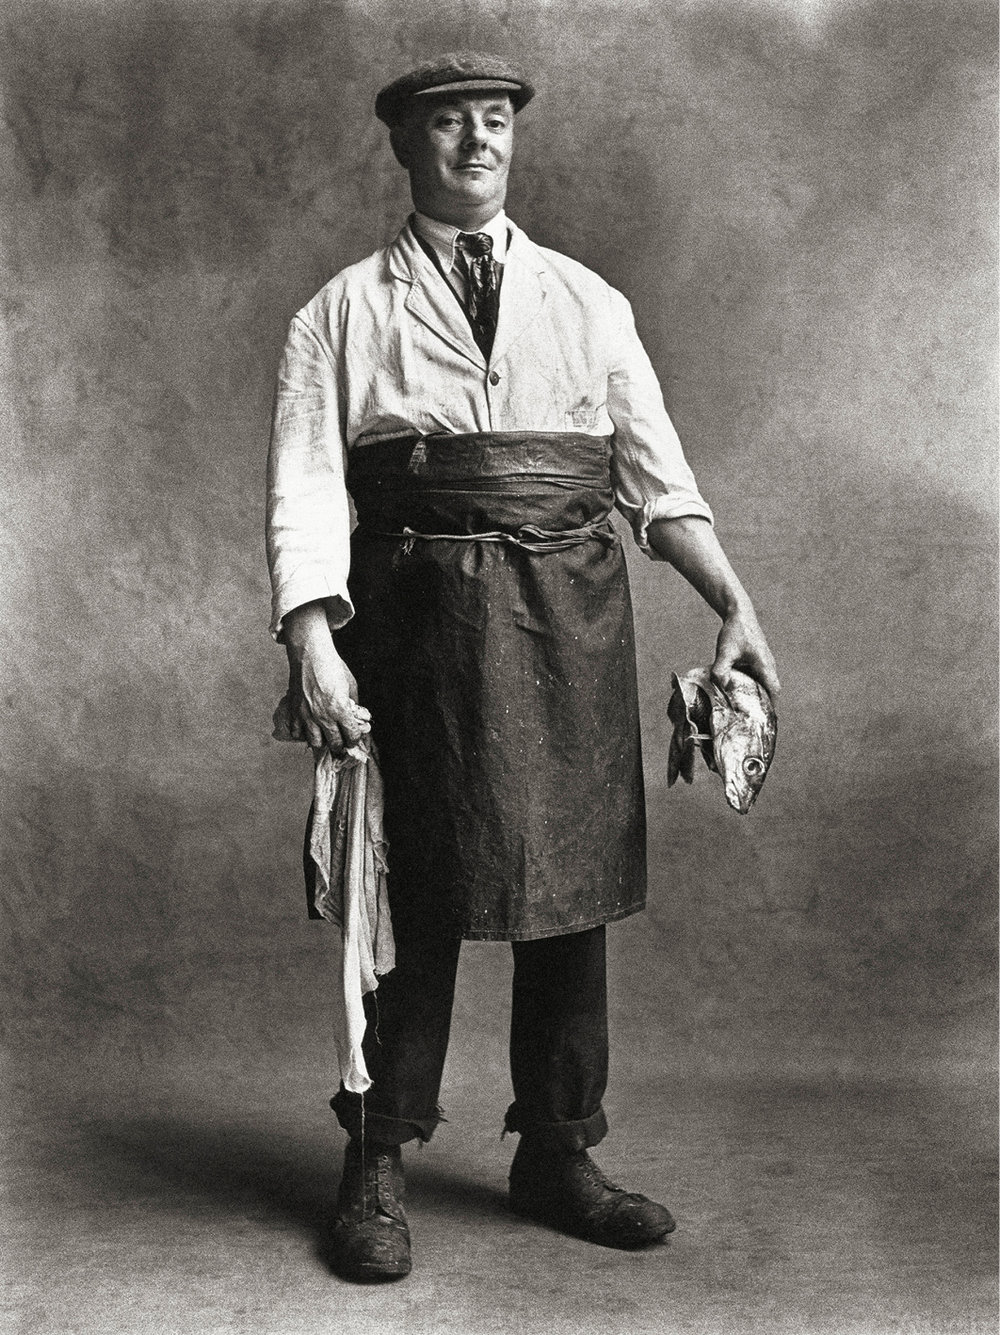 Irving Penn (American, 1917–2009). Fishmonger, London, 1950. Platinum-palladium print, 1976 · 19 3⁄4 × 14 7⁄8 in. (50.2 × 37.8 cm).